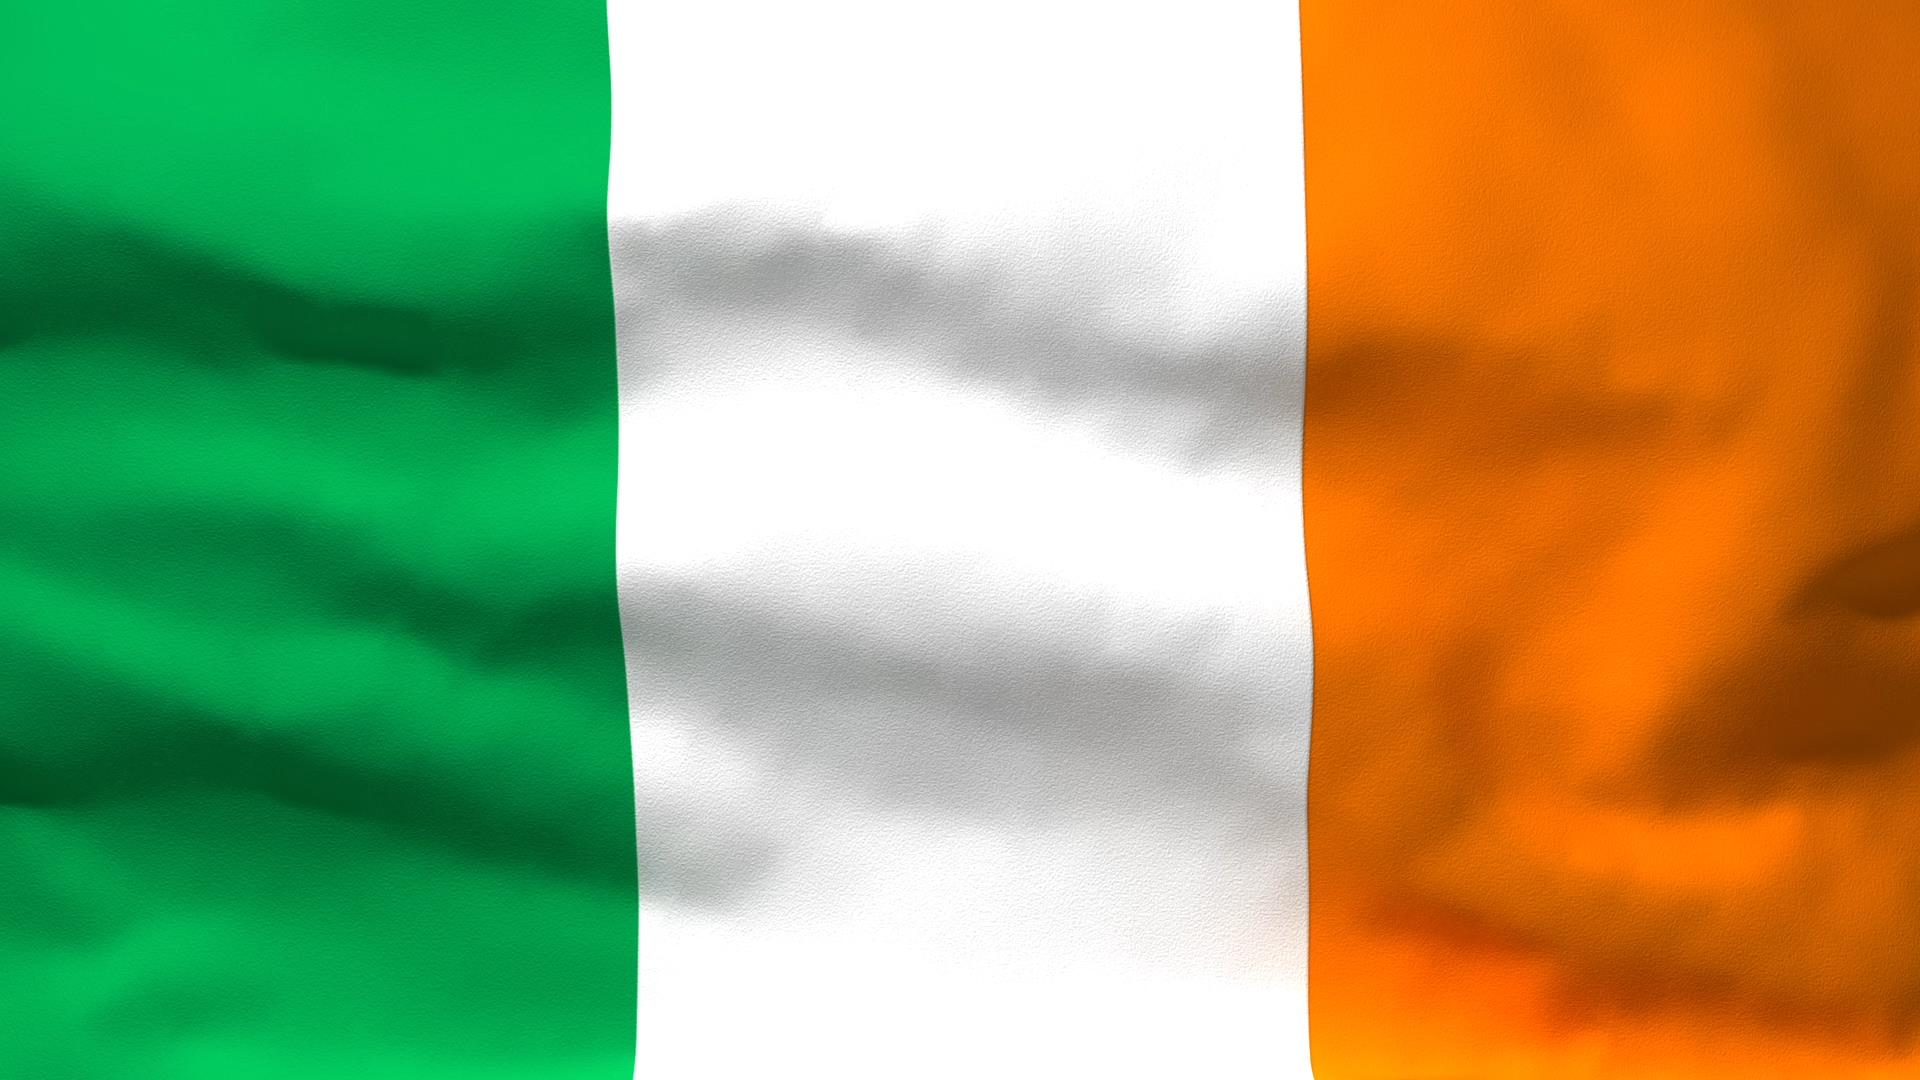 HD Ireland Flag Wallpapers Download   793636 1920x1080